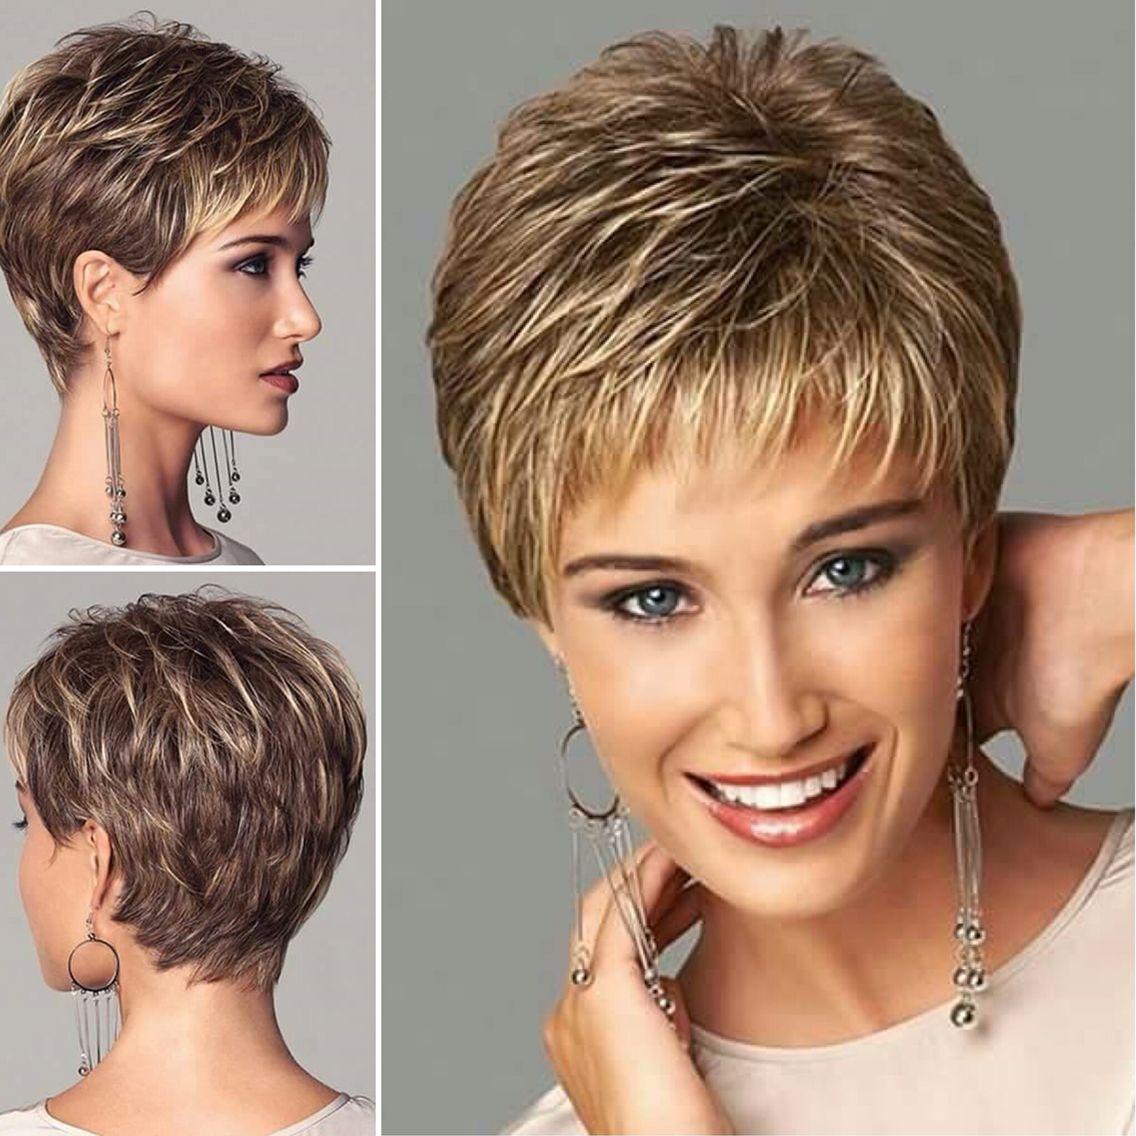 Boy hairstyle wigs beautiful colours u cut  korte kapsels dames  pinterest  hair